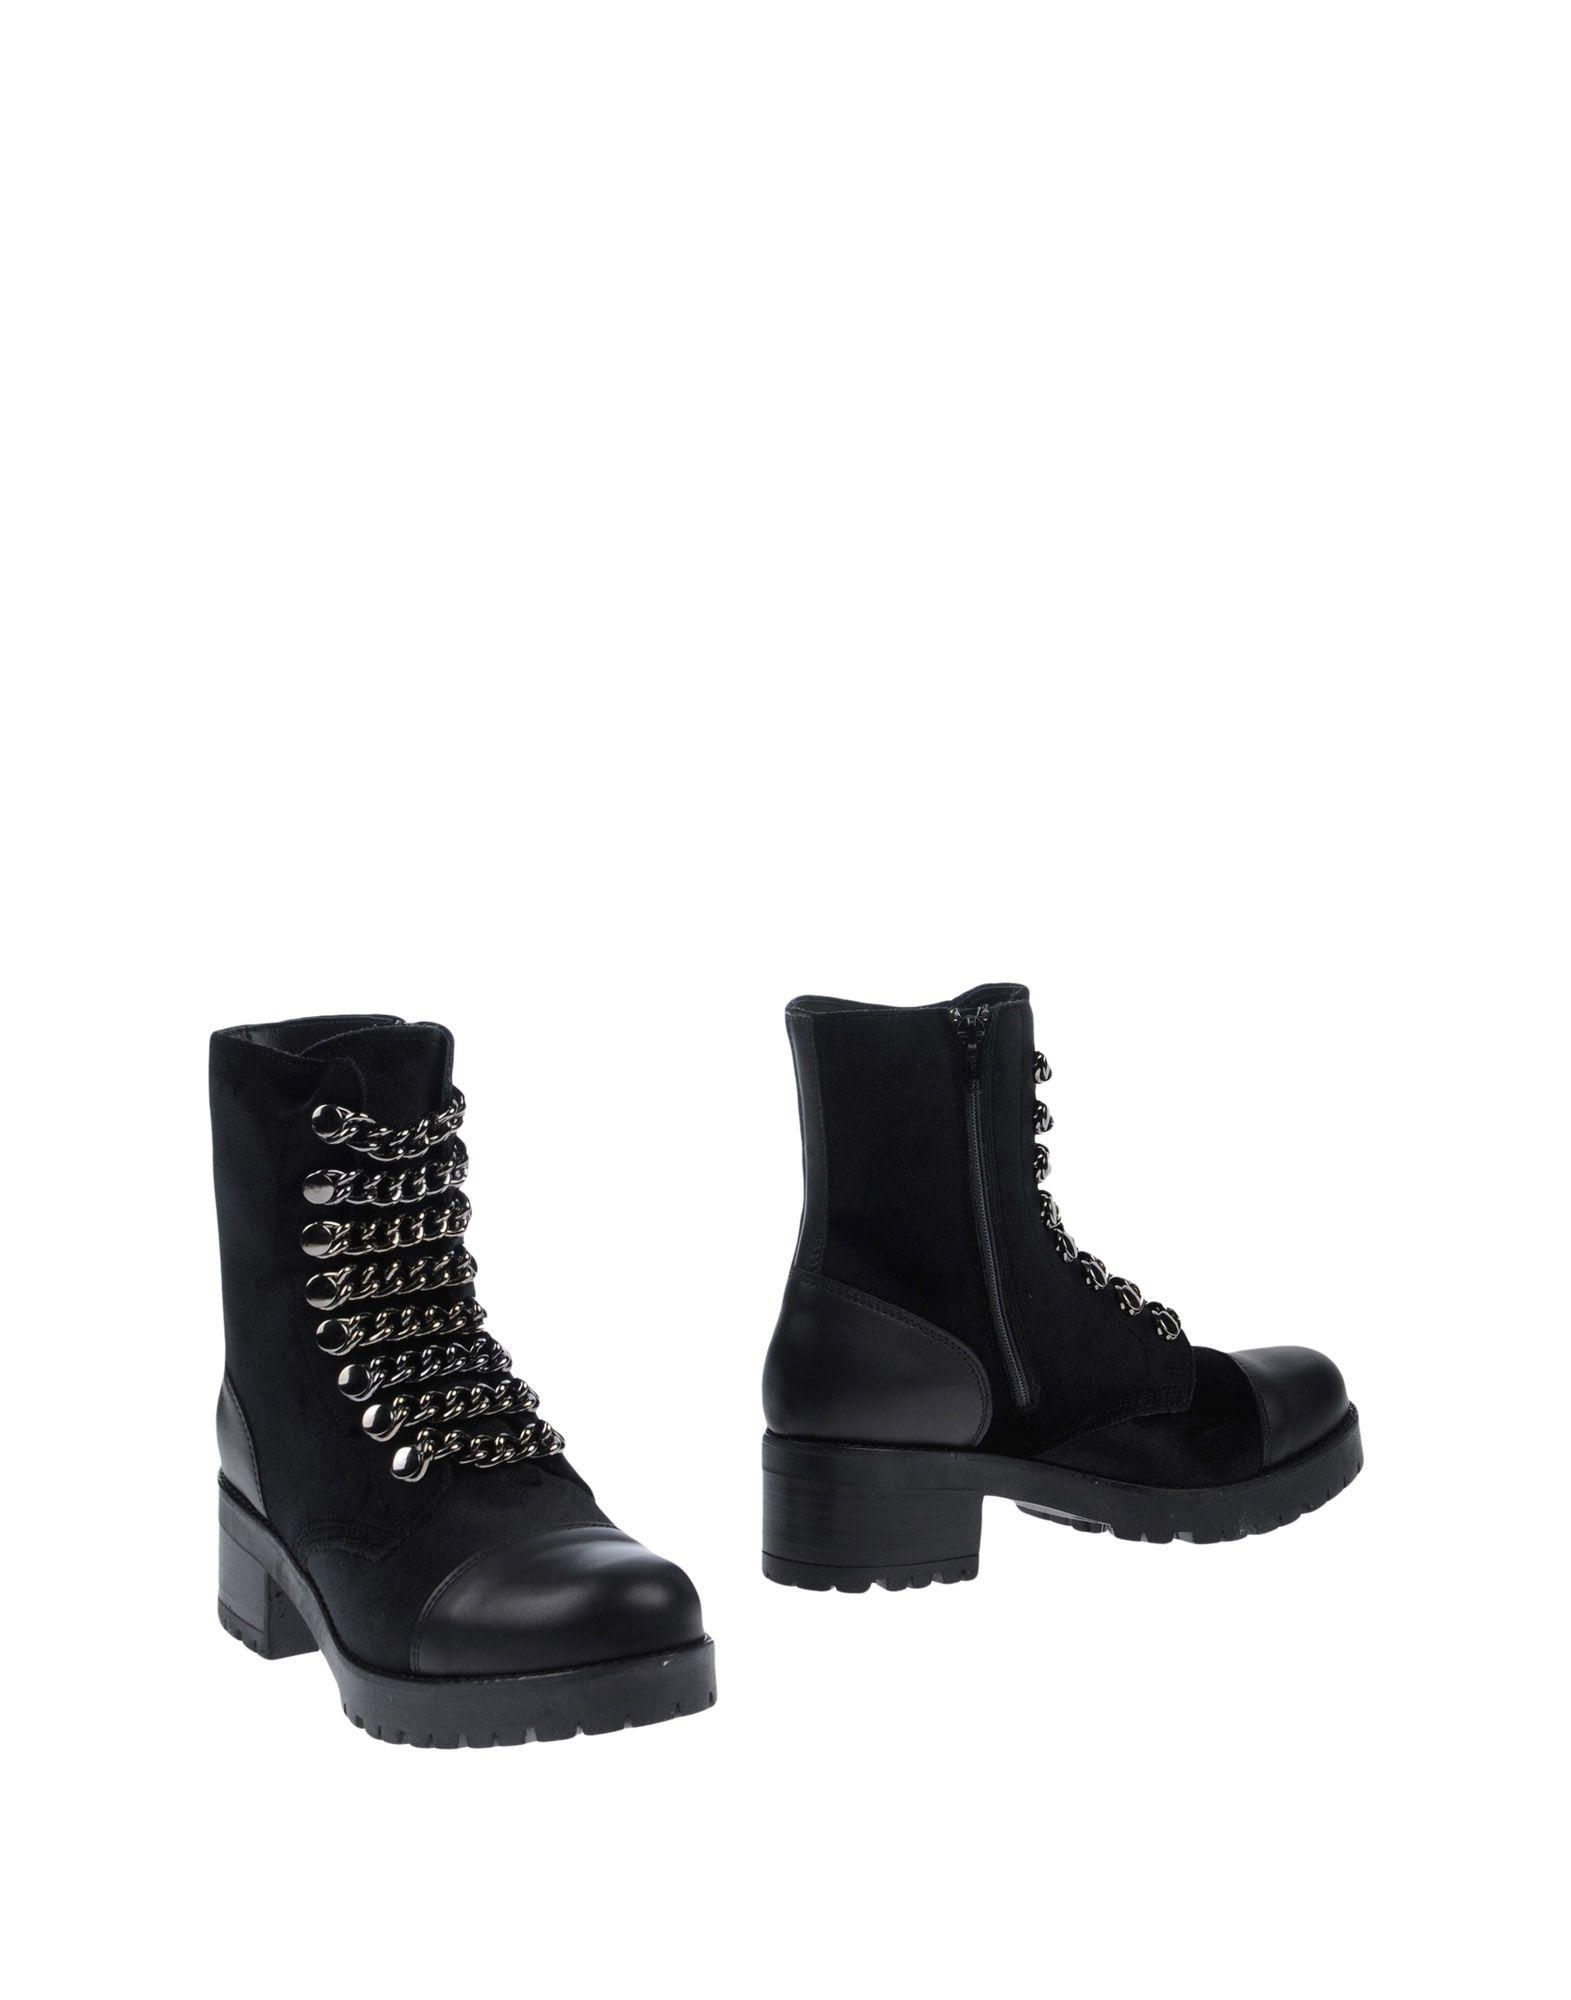 Le Dangerouge Stiefelette Damen  11506215LSGut aussehende strapazierfähige Schuhe